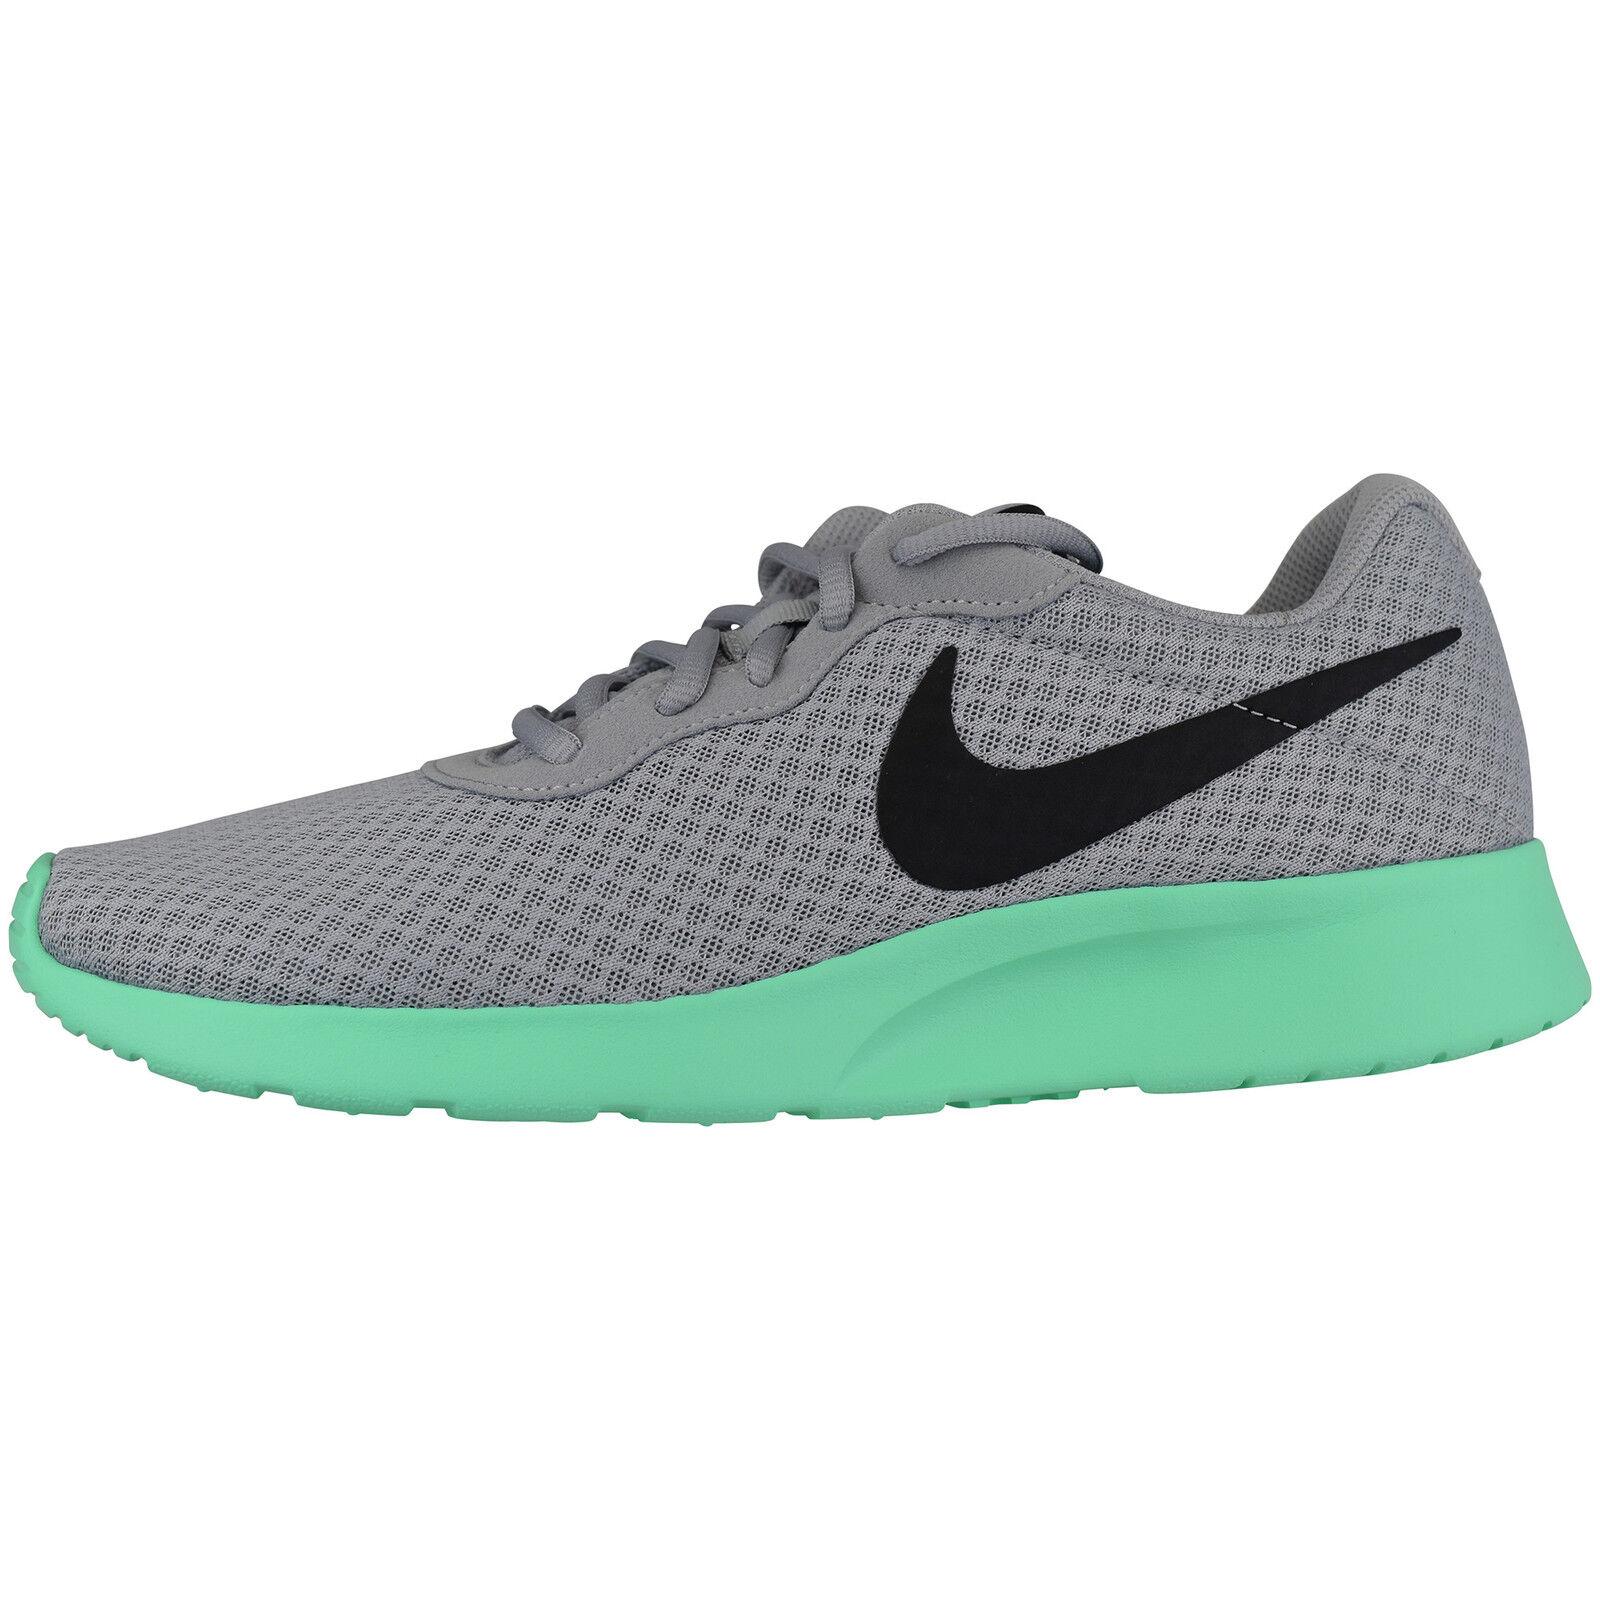 Nike Tanjun 812654-003 Lifestyle Running Freizeit Sneaker Laufschuhe